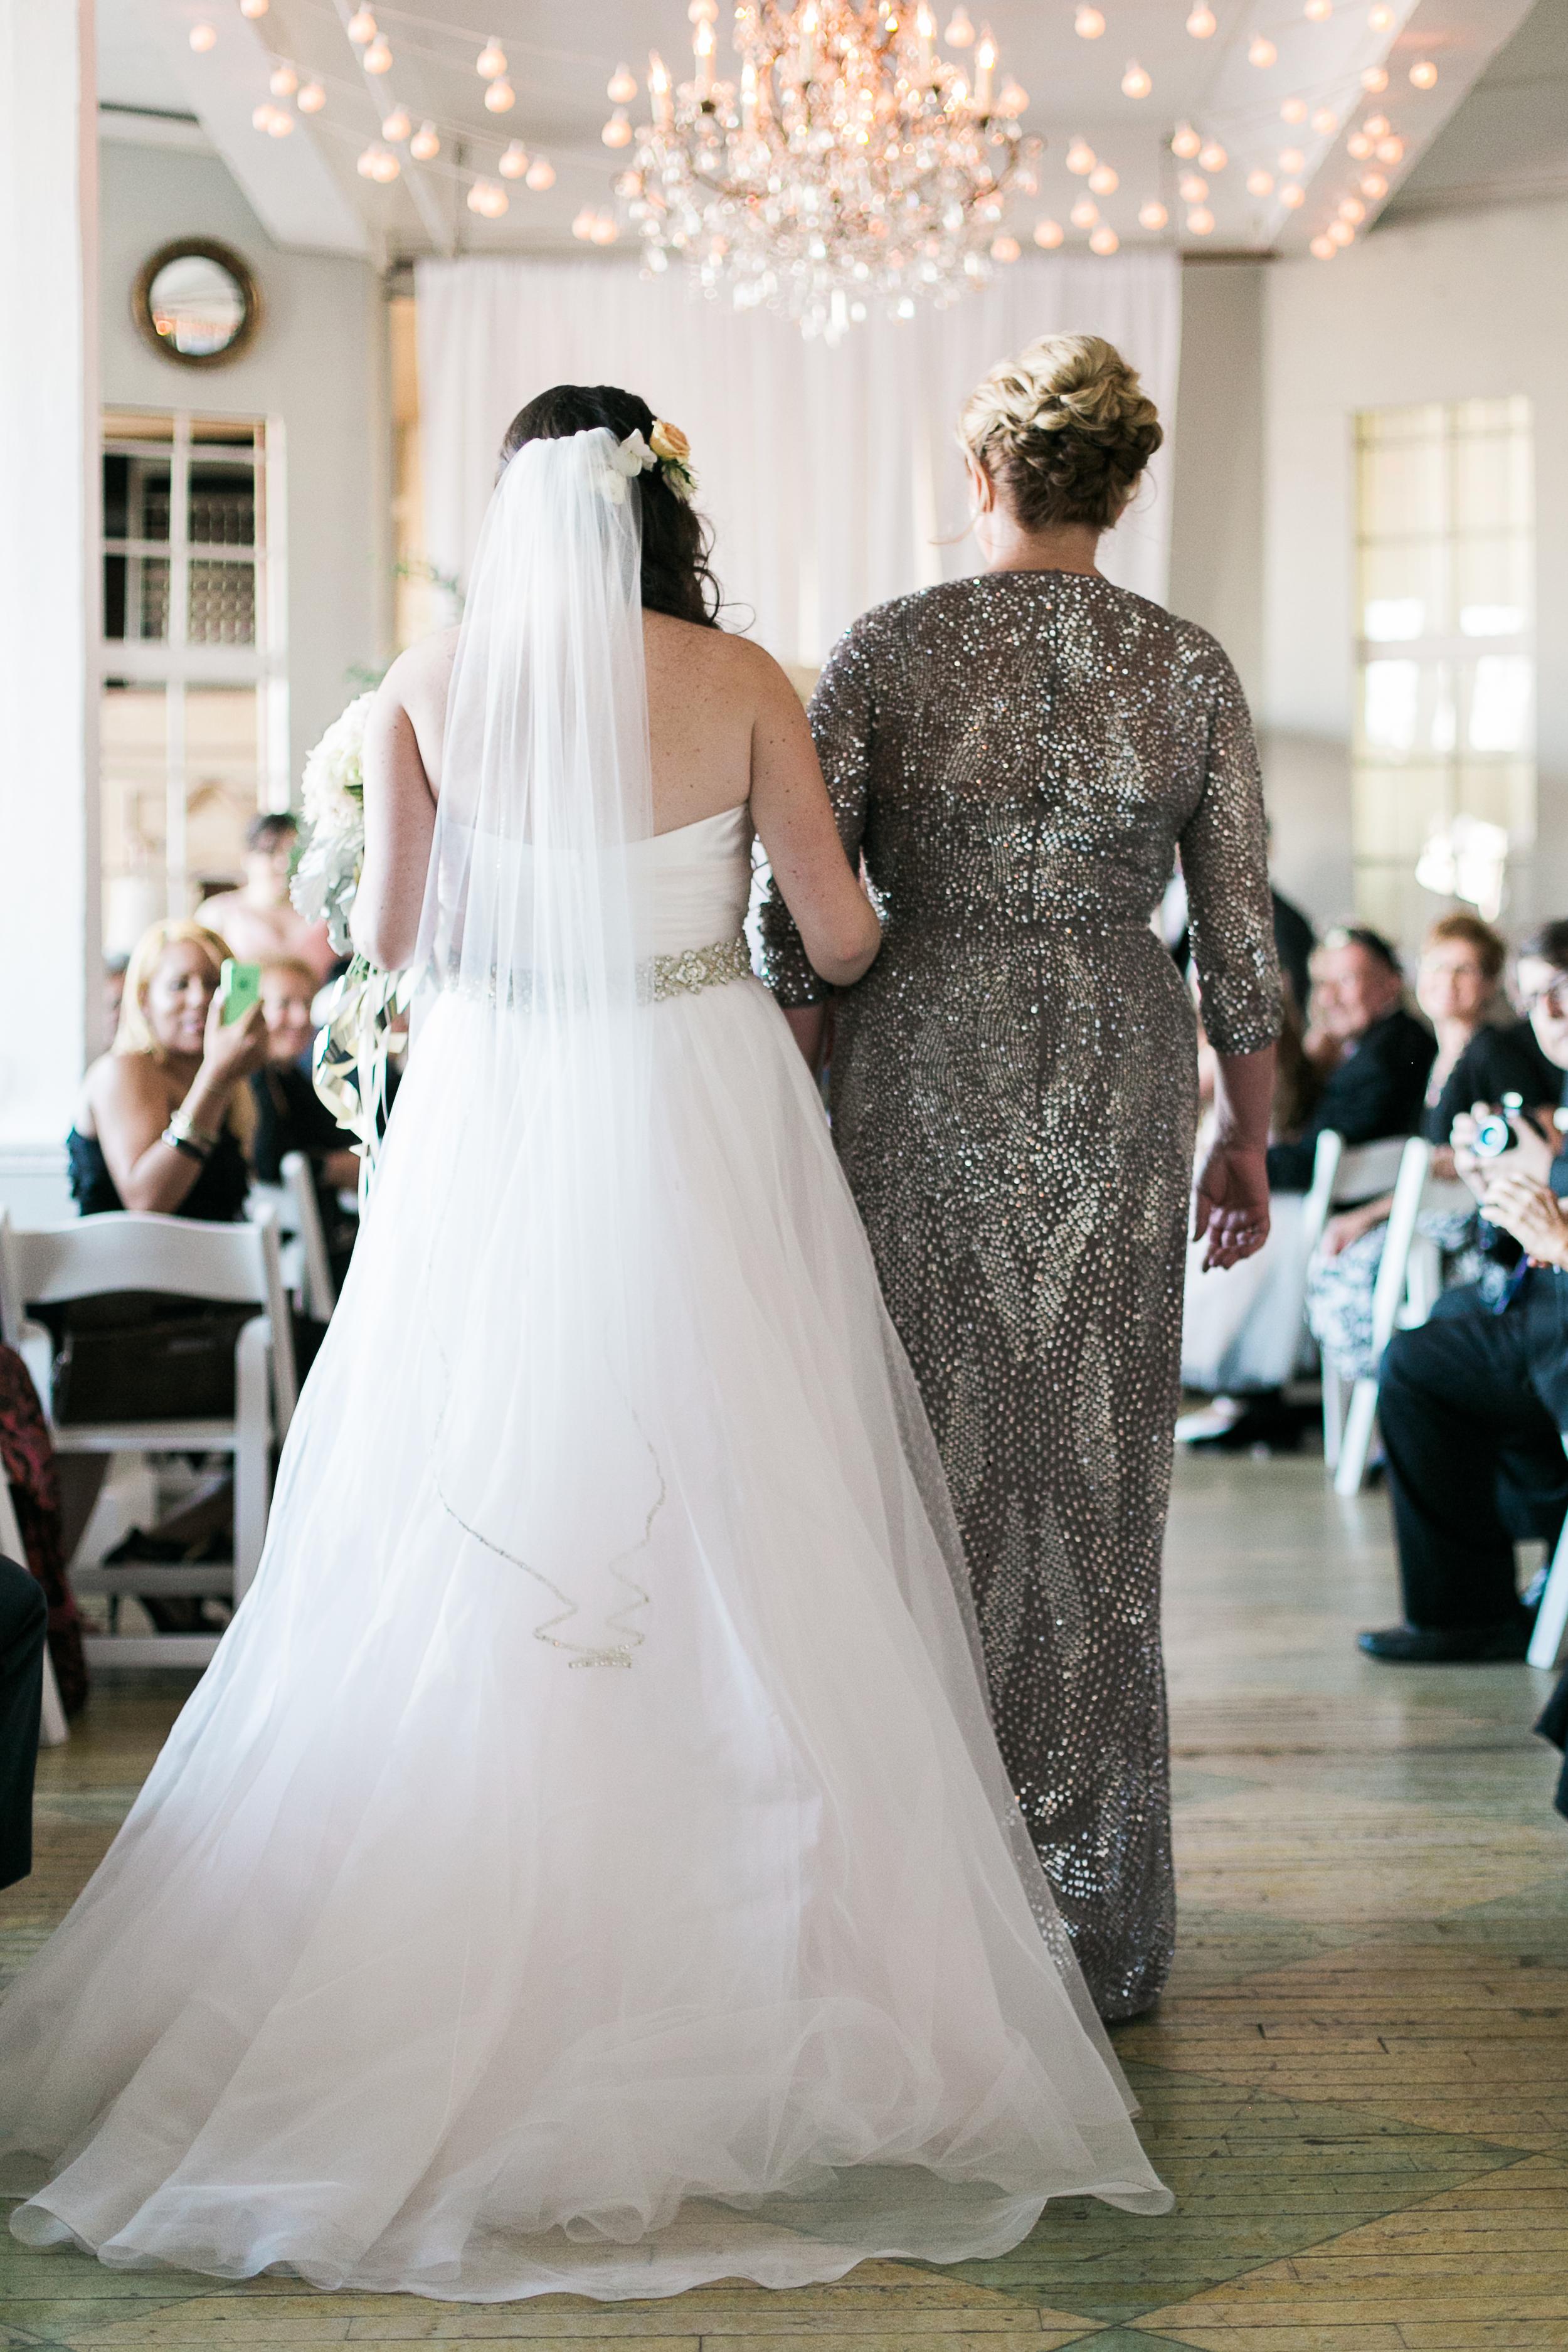 Metropolitan-Building-Brooklyn-Wedding-Michelle-Edgemont-Jove-Meyer-Events-033.jpg